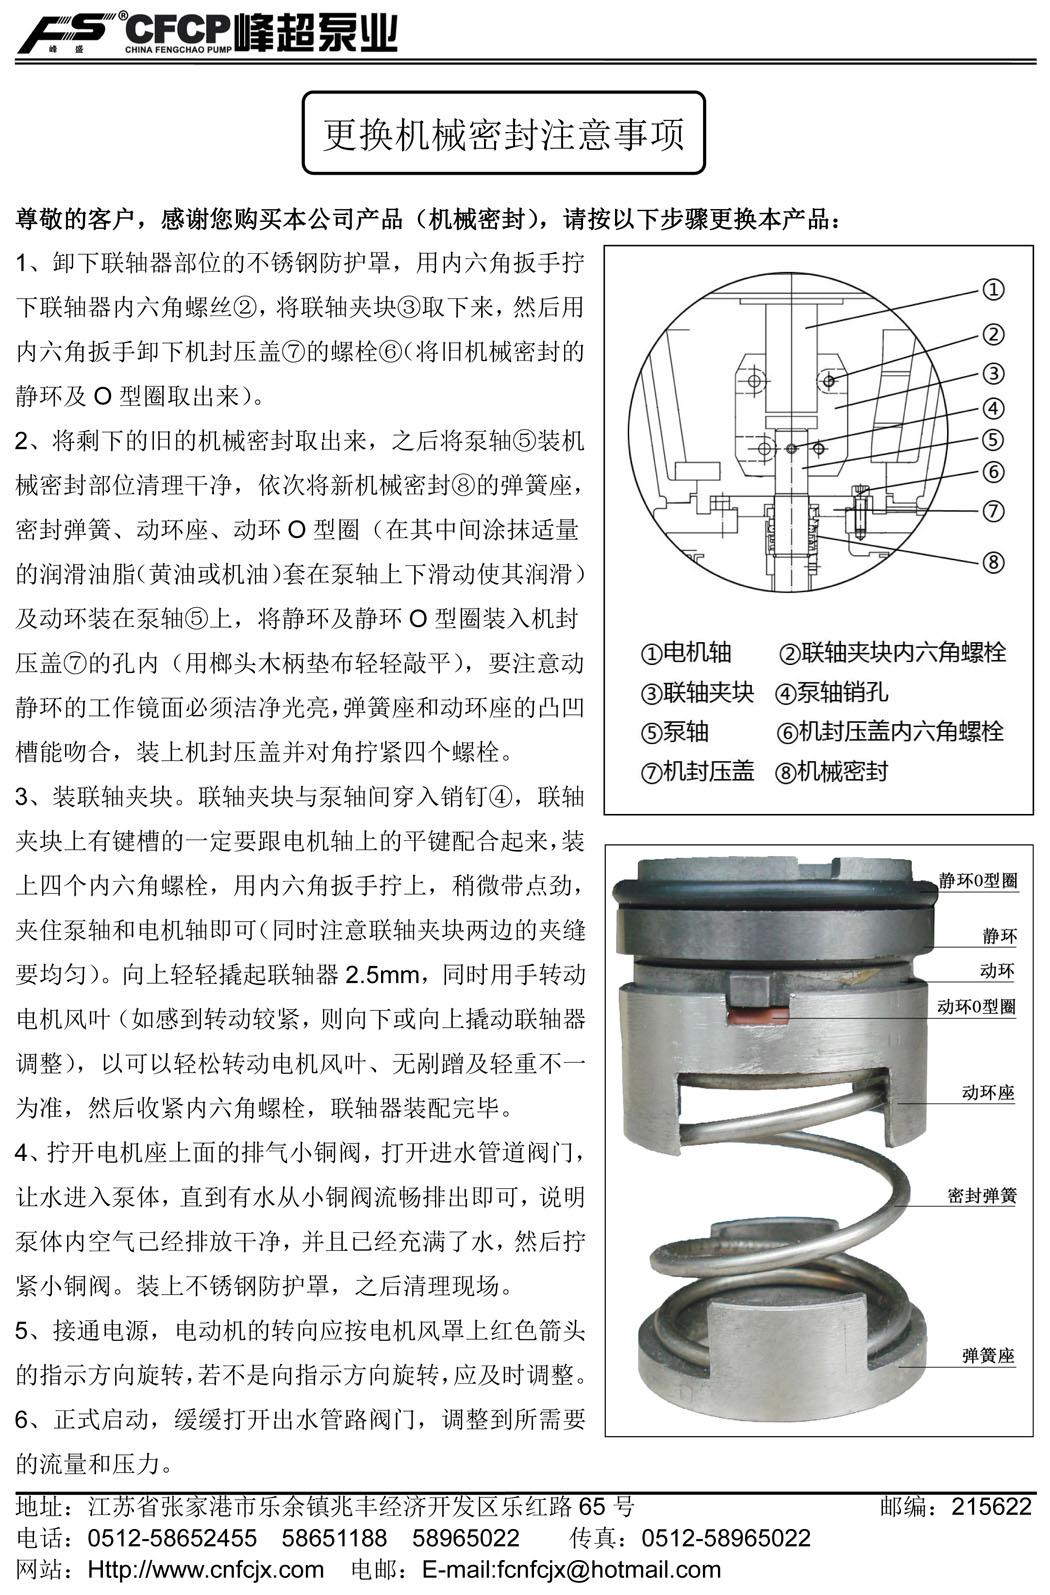 【12.5-90T新型机械密封更换方法】.jpg